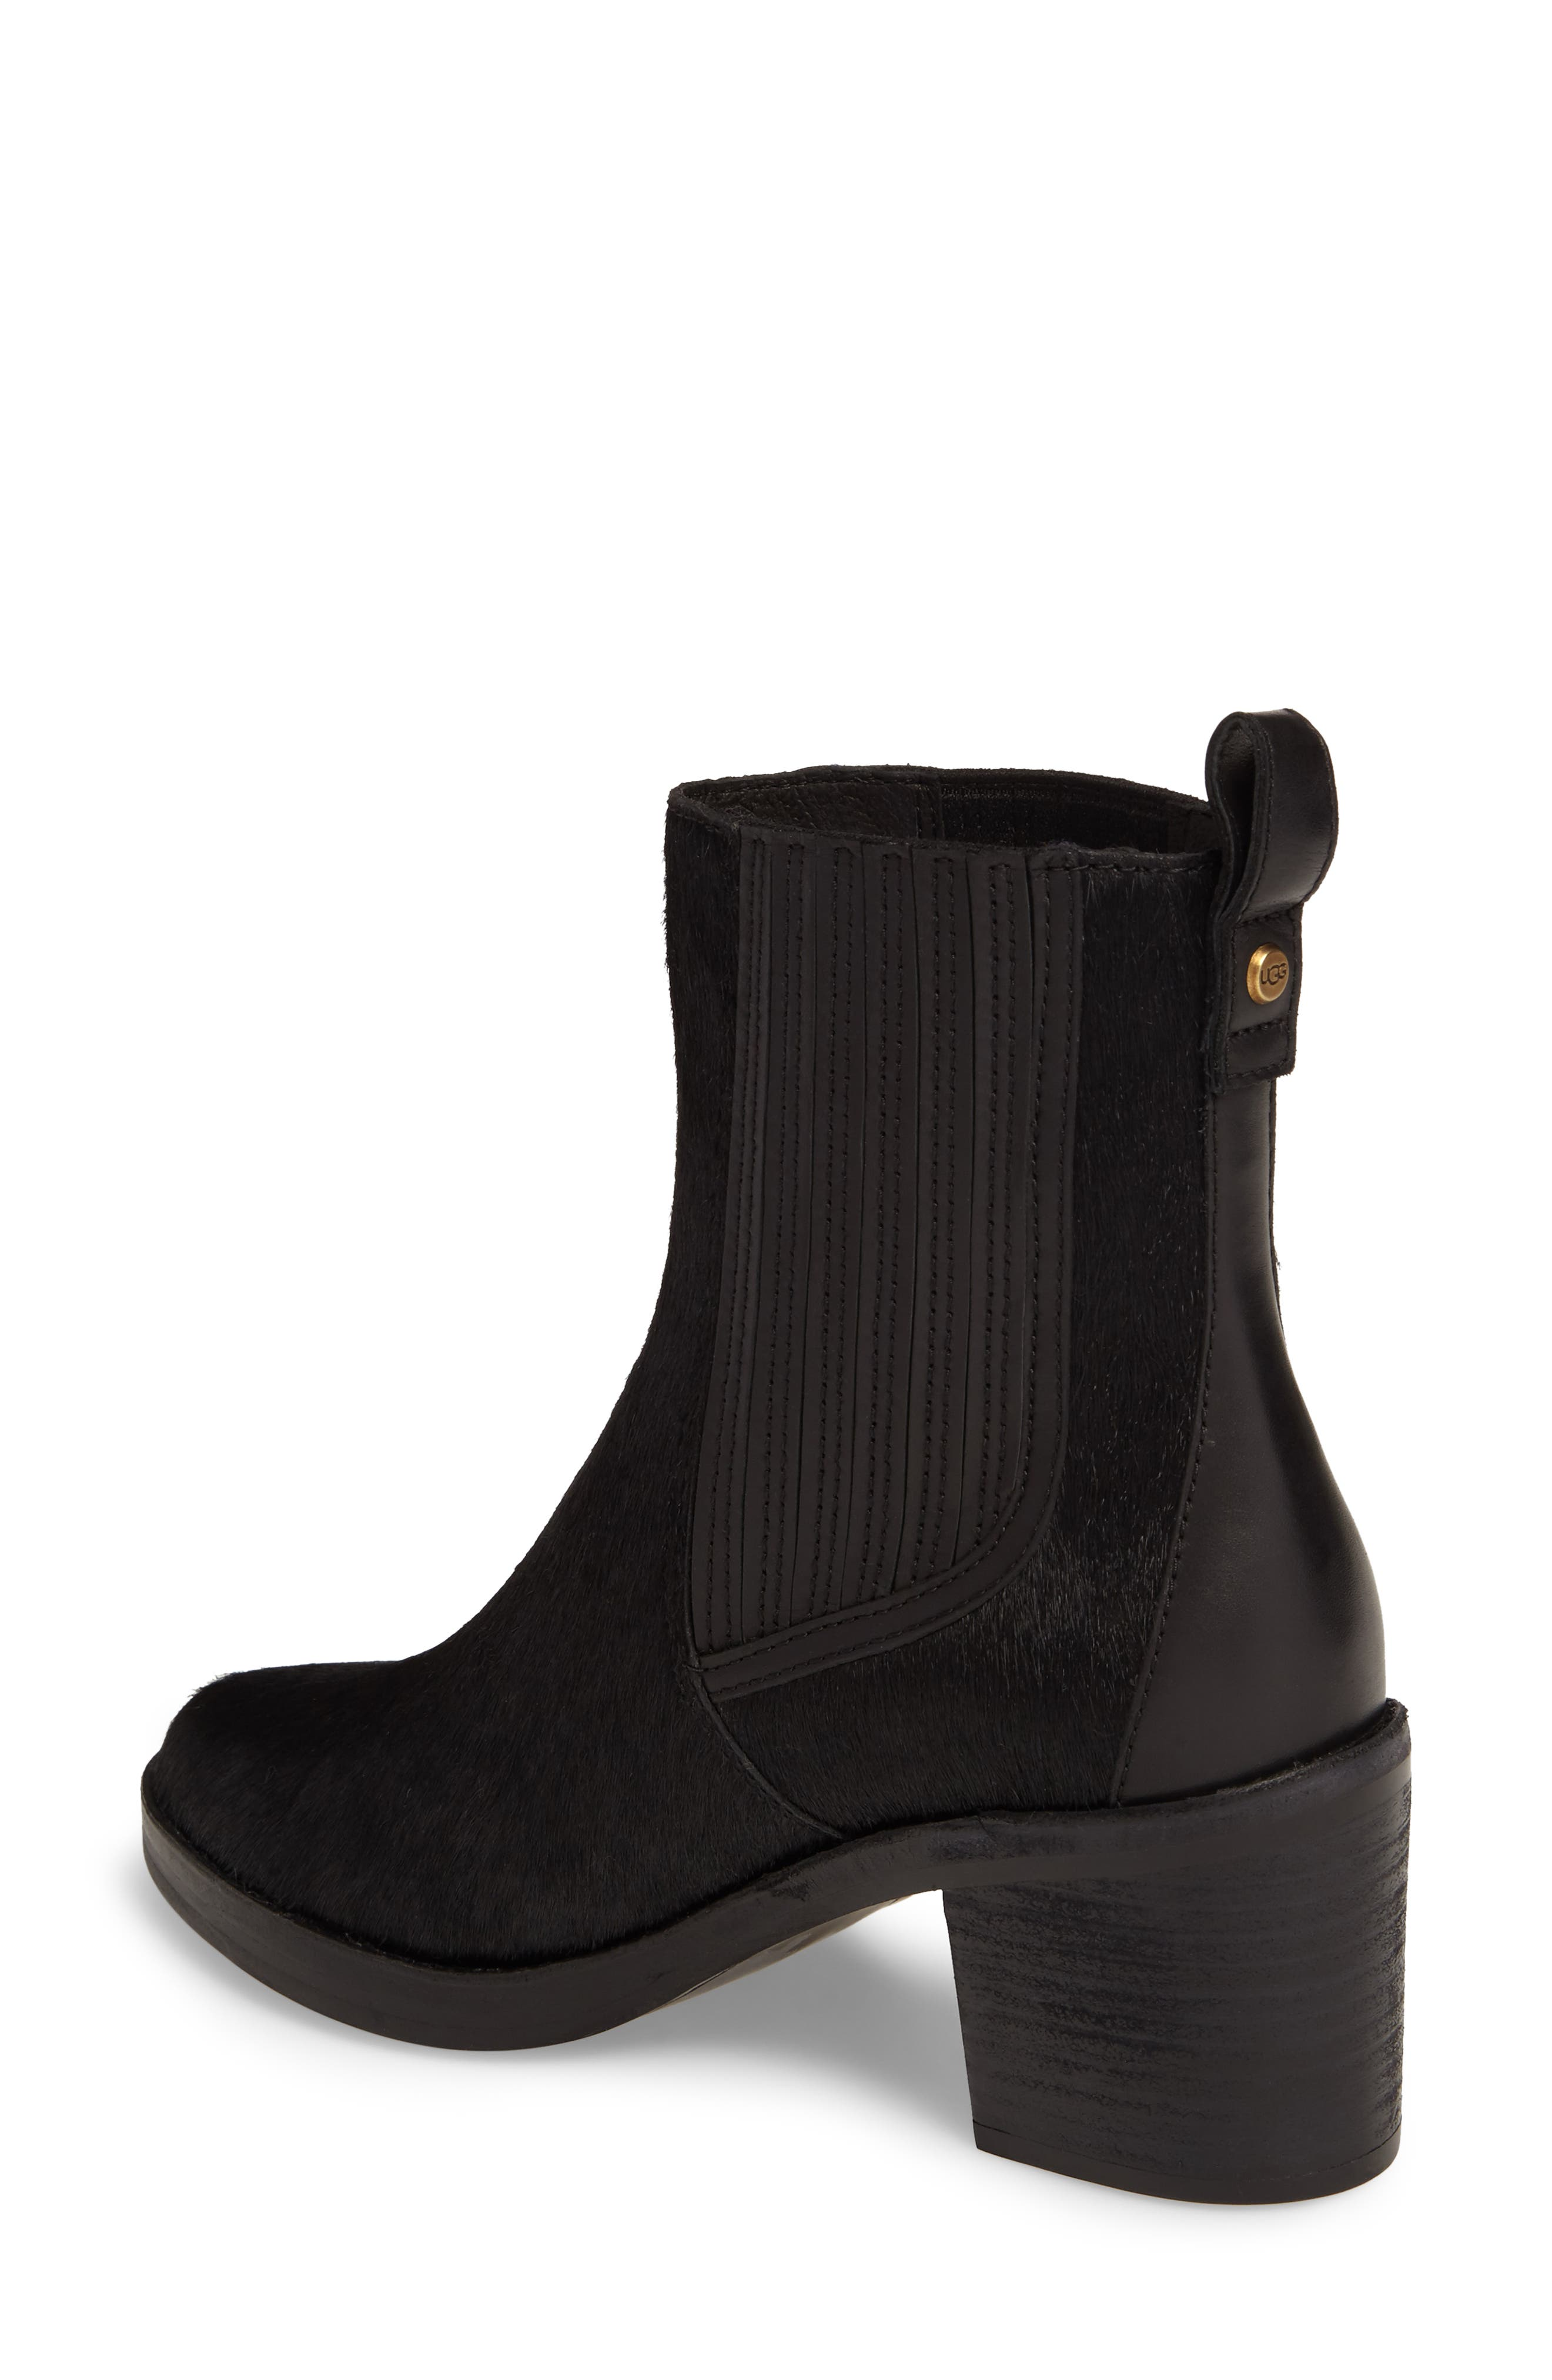 Camden Genuine Calf Hair Chelsea Boot,                             Alternate thumbnail 2, color,                             Black Calf Hair Leather